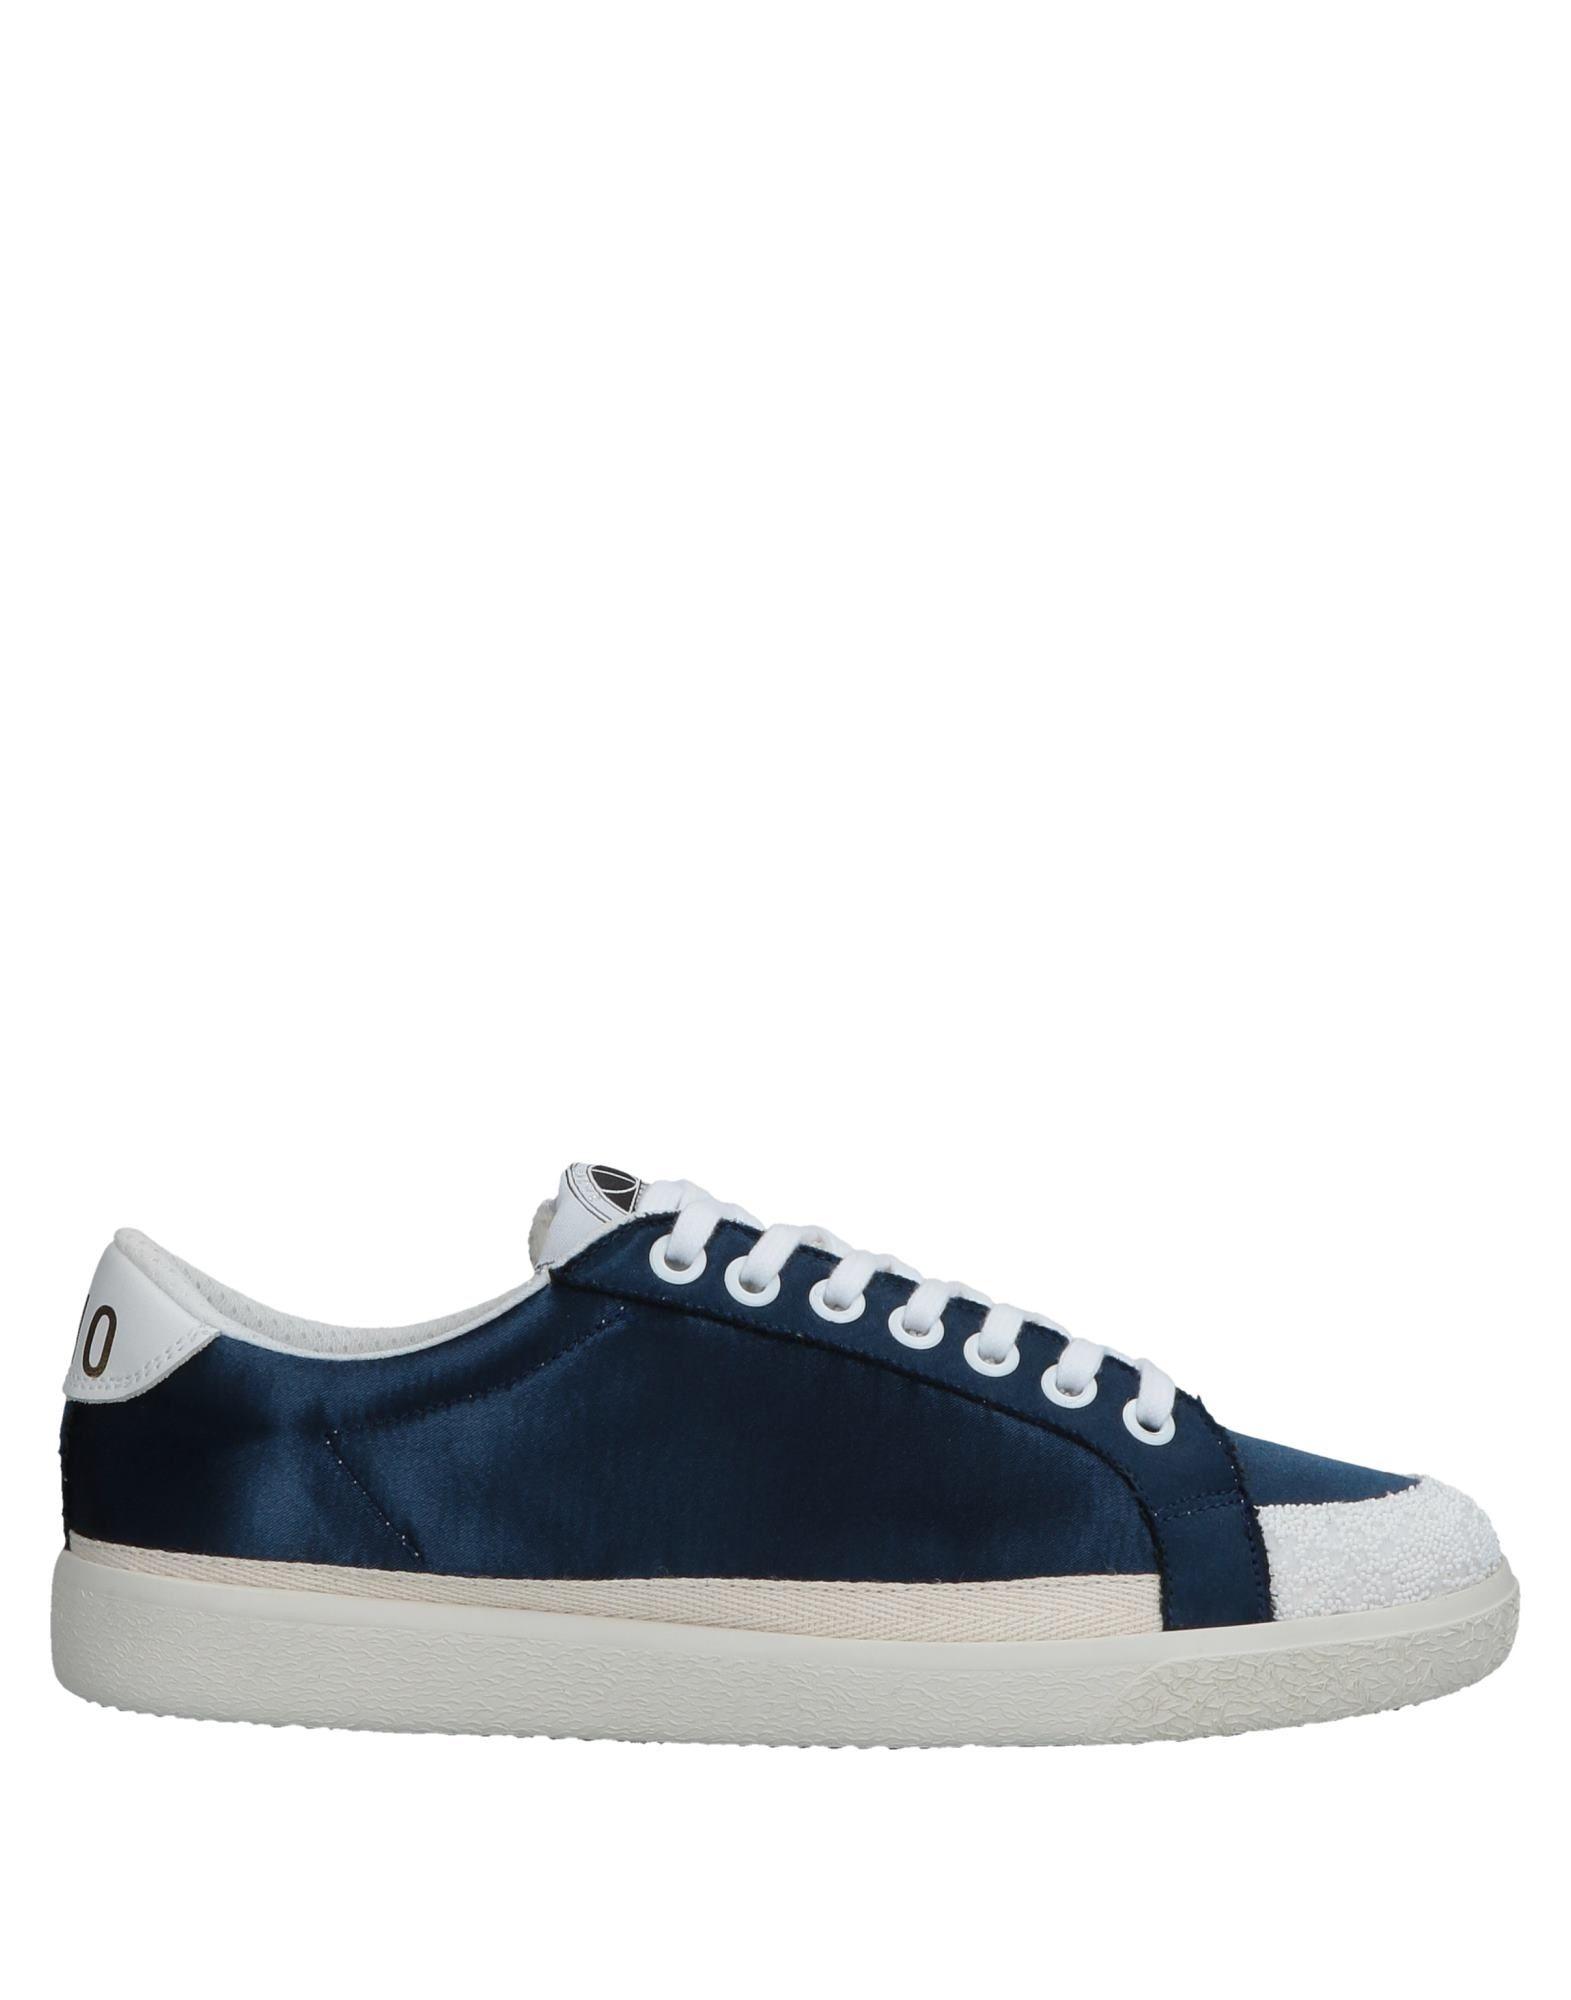 Pantofola D'oro Sneakers Sneakers